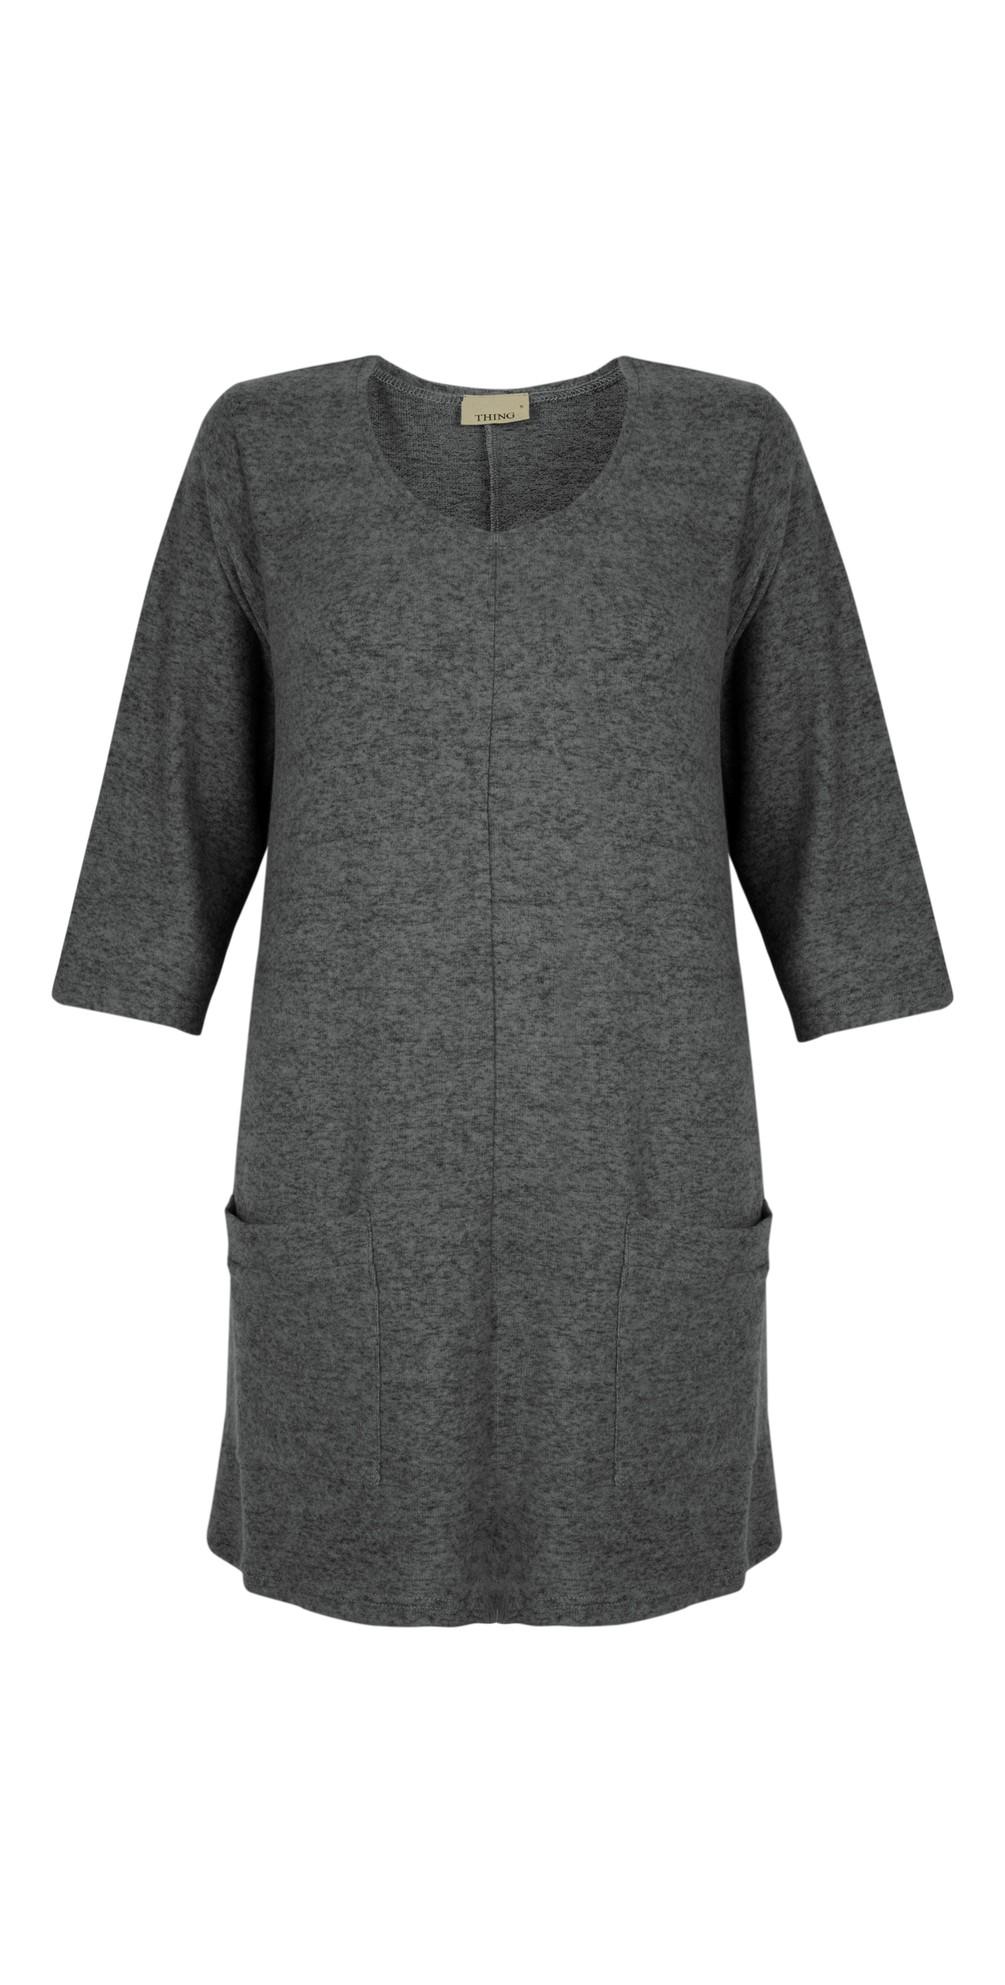 Supersoft Fleece Pocket Tunic Top main image